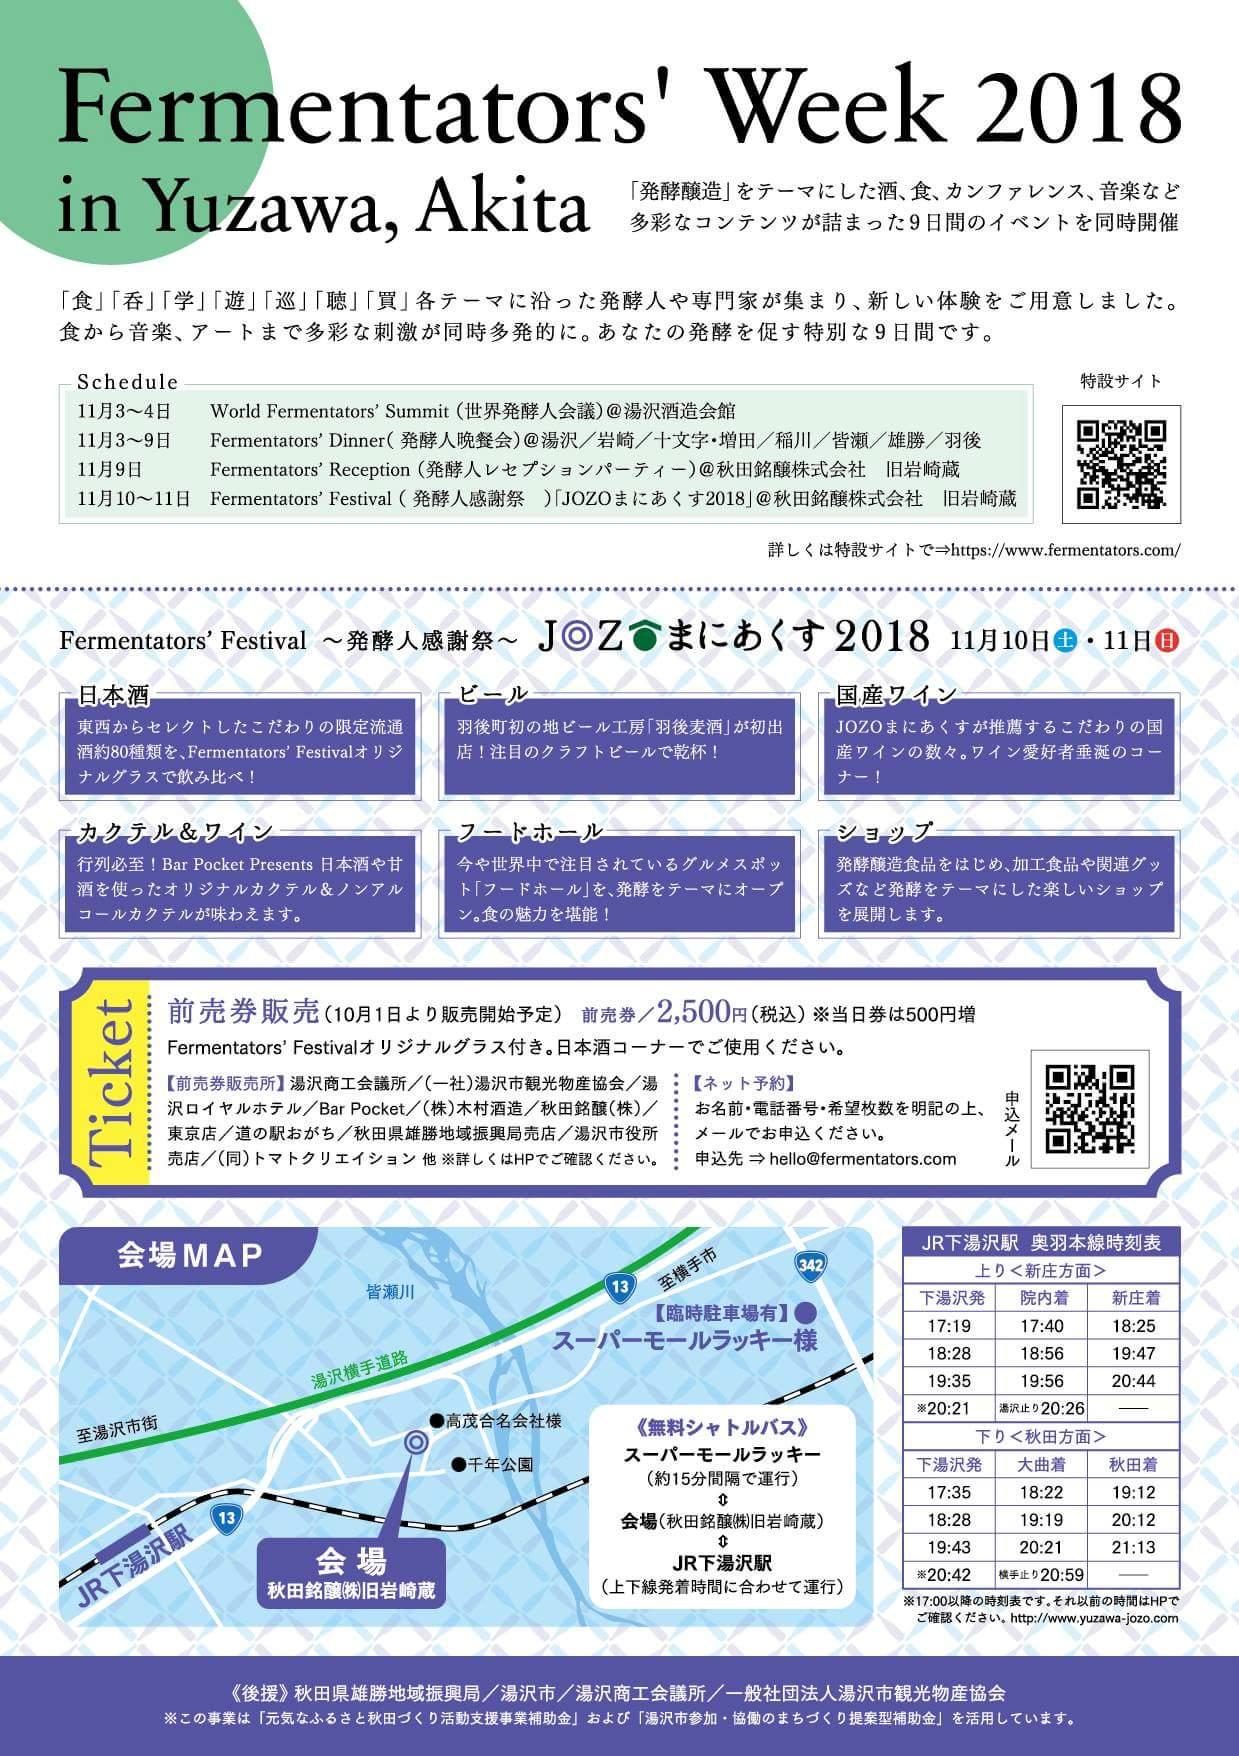 http://www.fukukomachi.com/blog/photo/FB_IMG_1538654420997.jpg